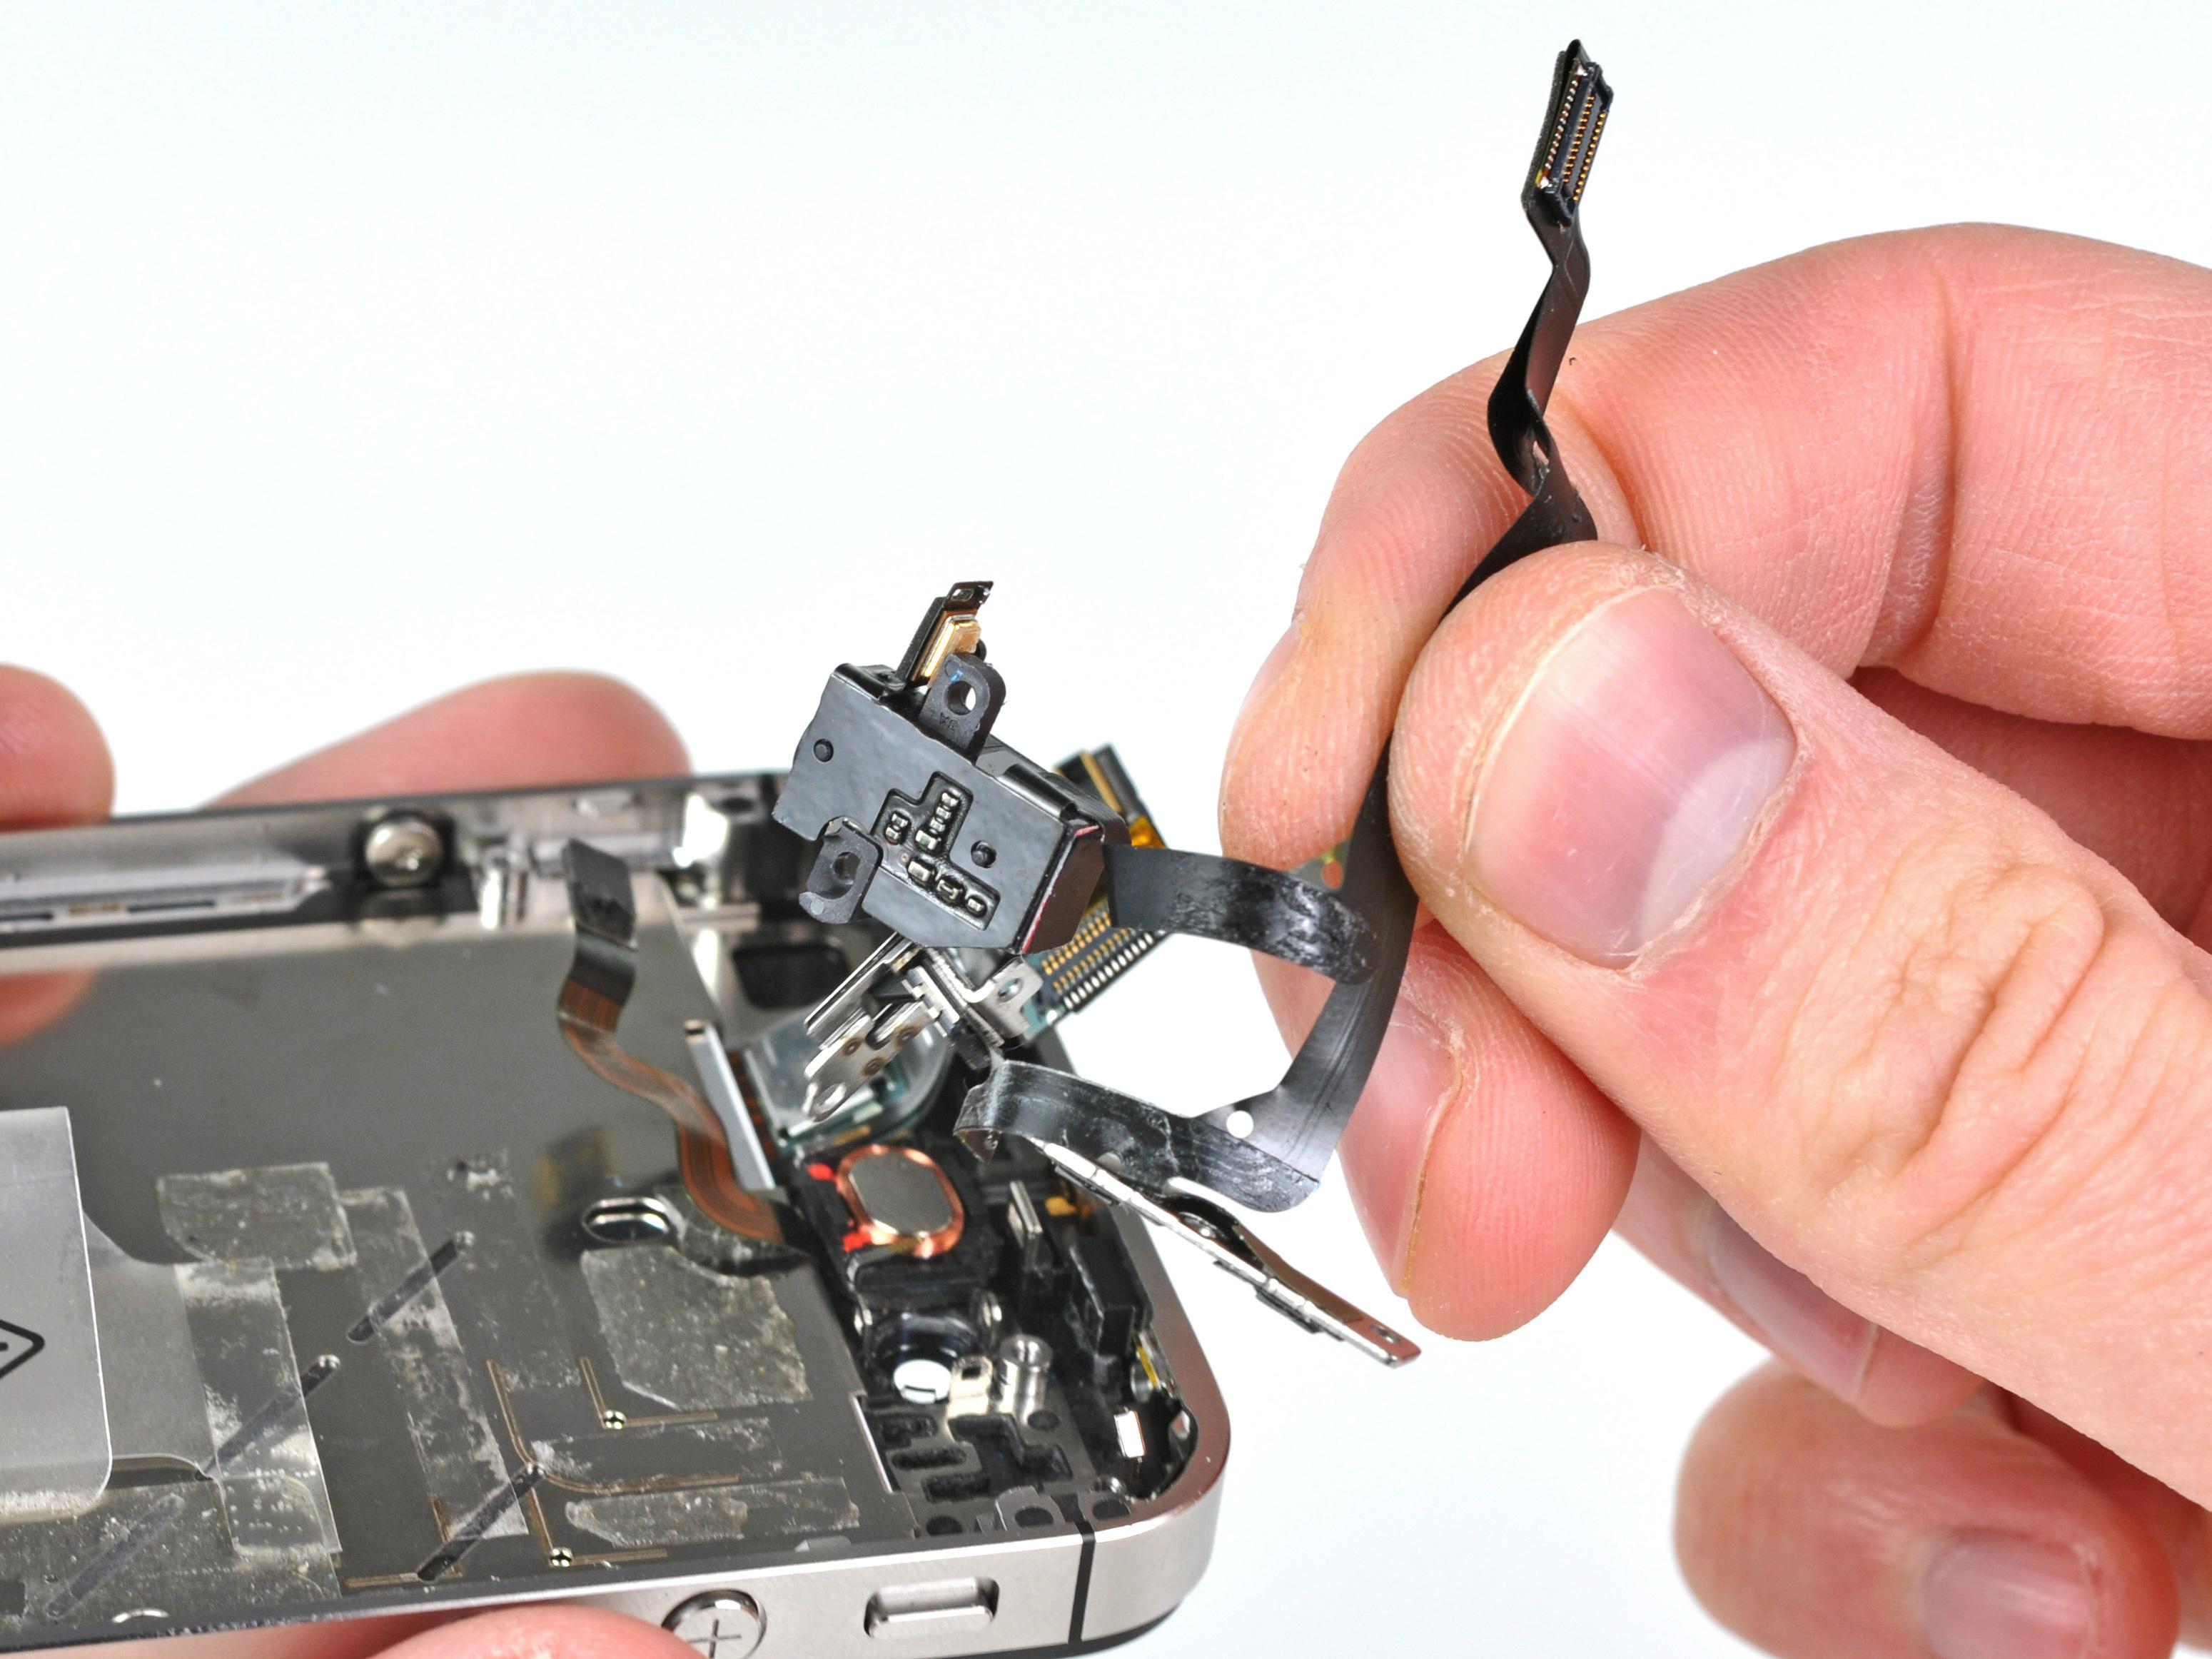 iphone 4 service manual download